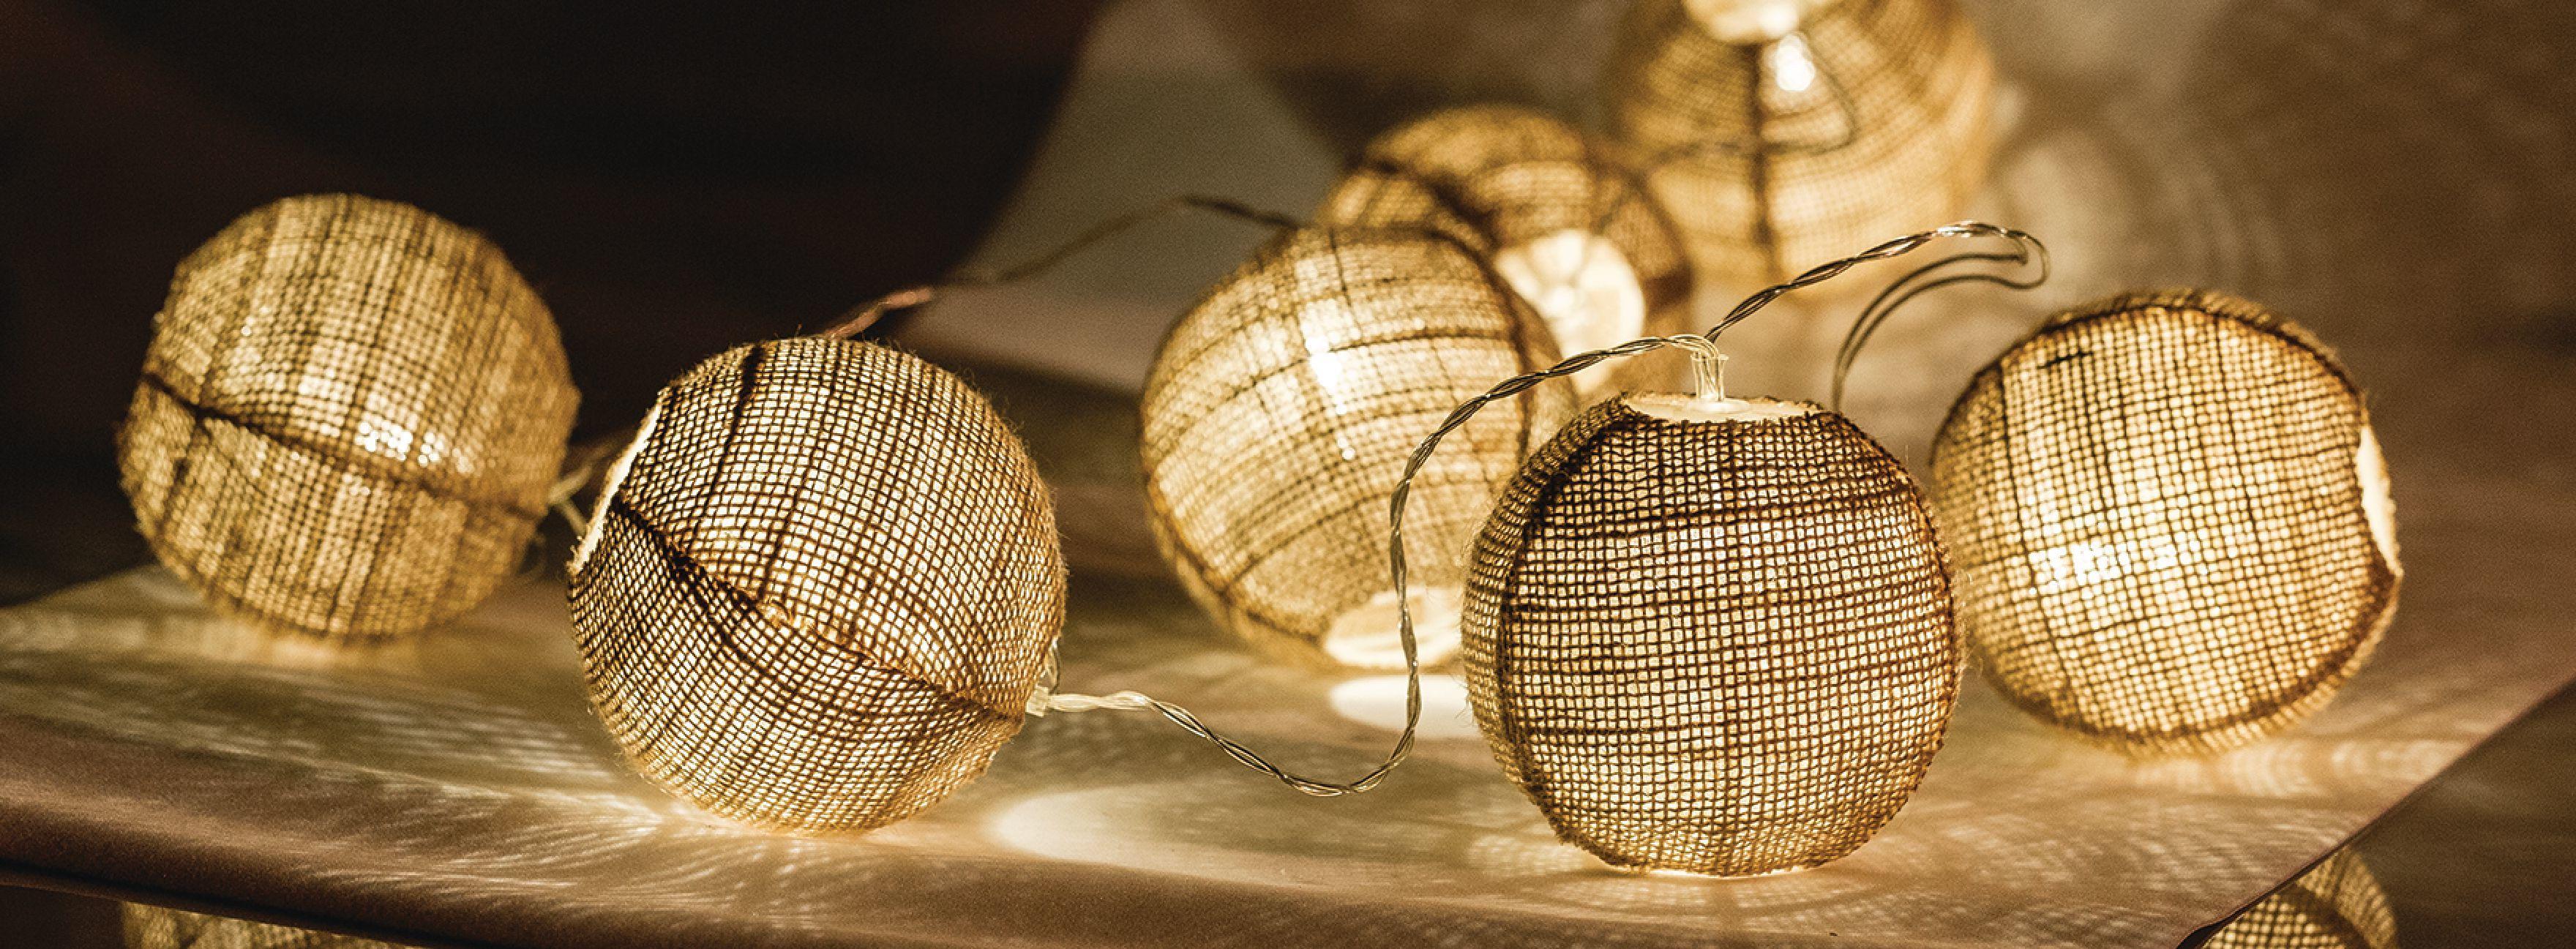 HQ decoratieve verlichting 10x LED, 4.5V, 0.02W, 3 x AAA, Warm White ...